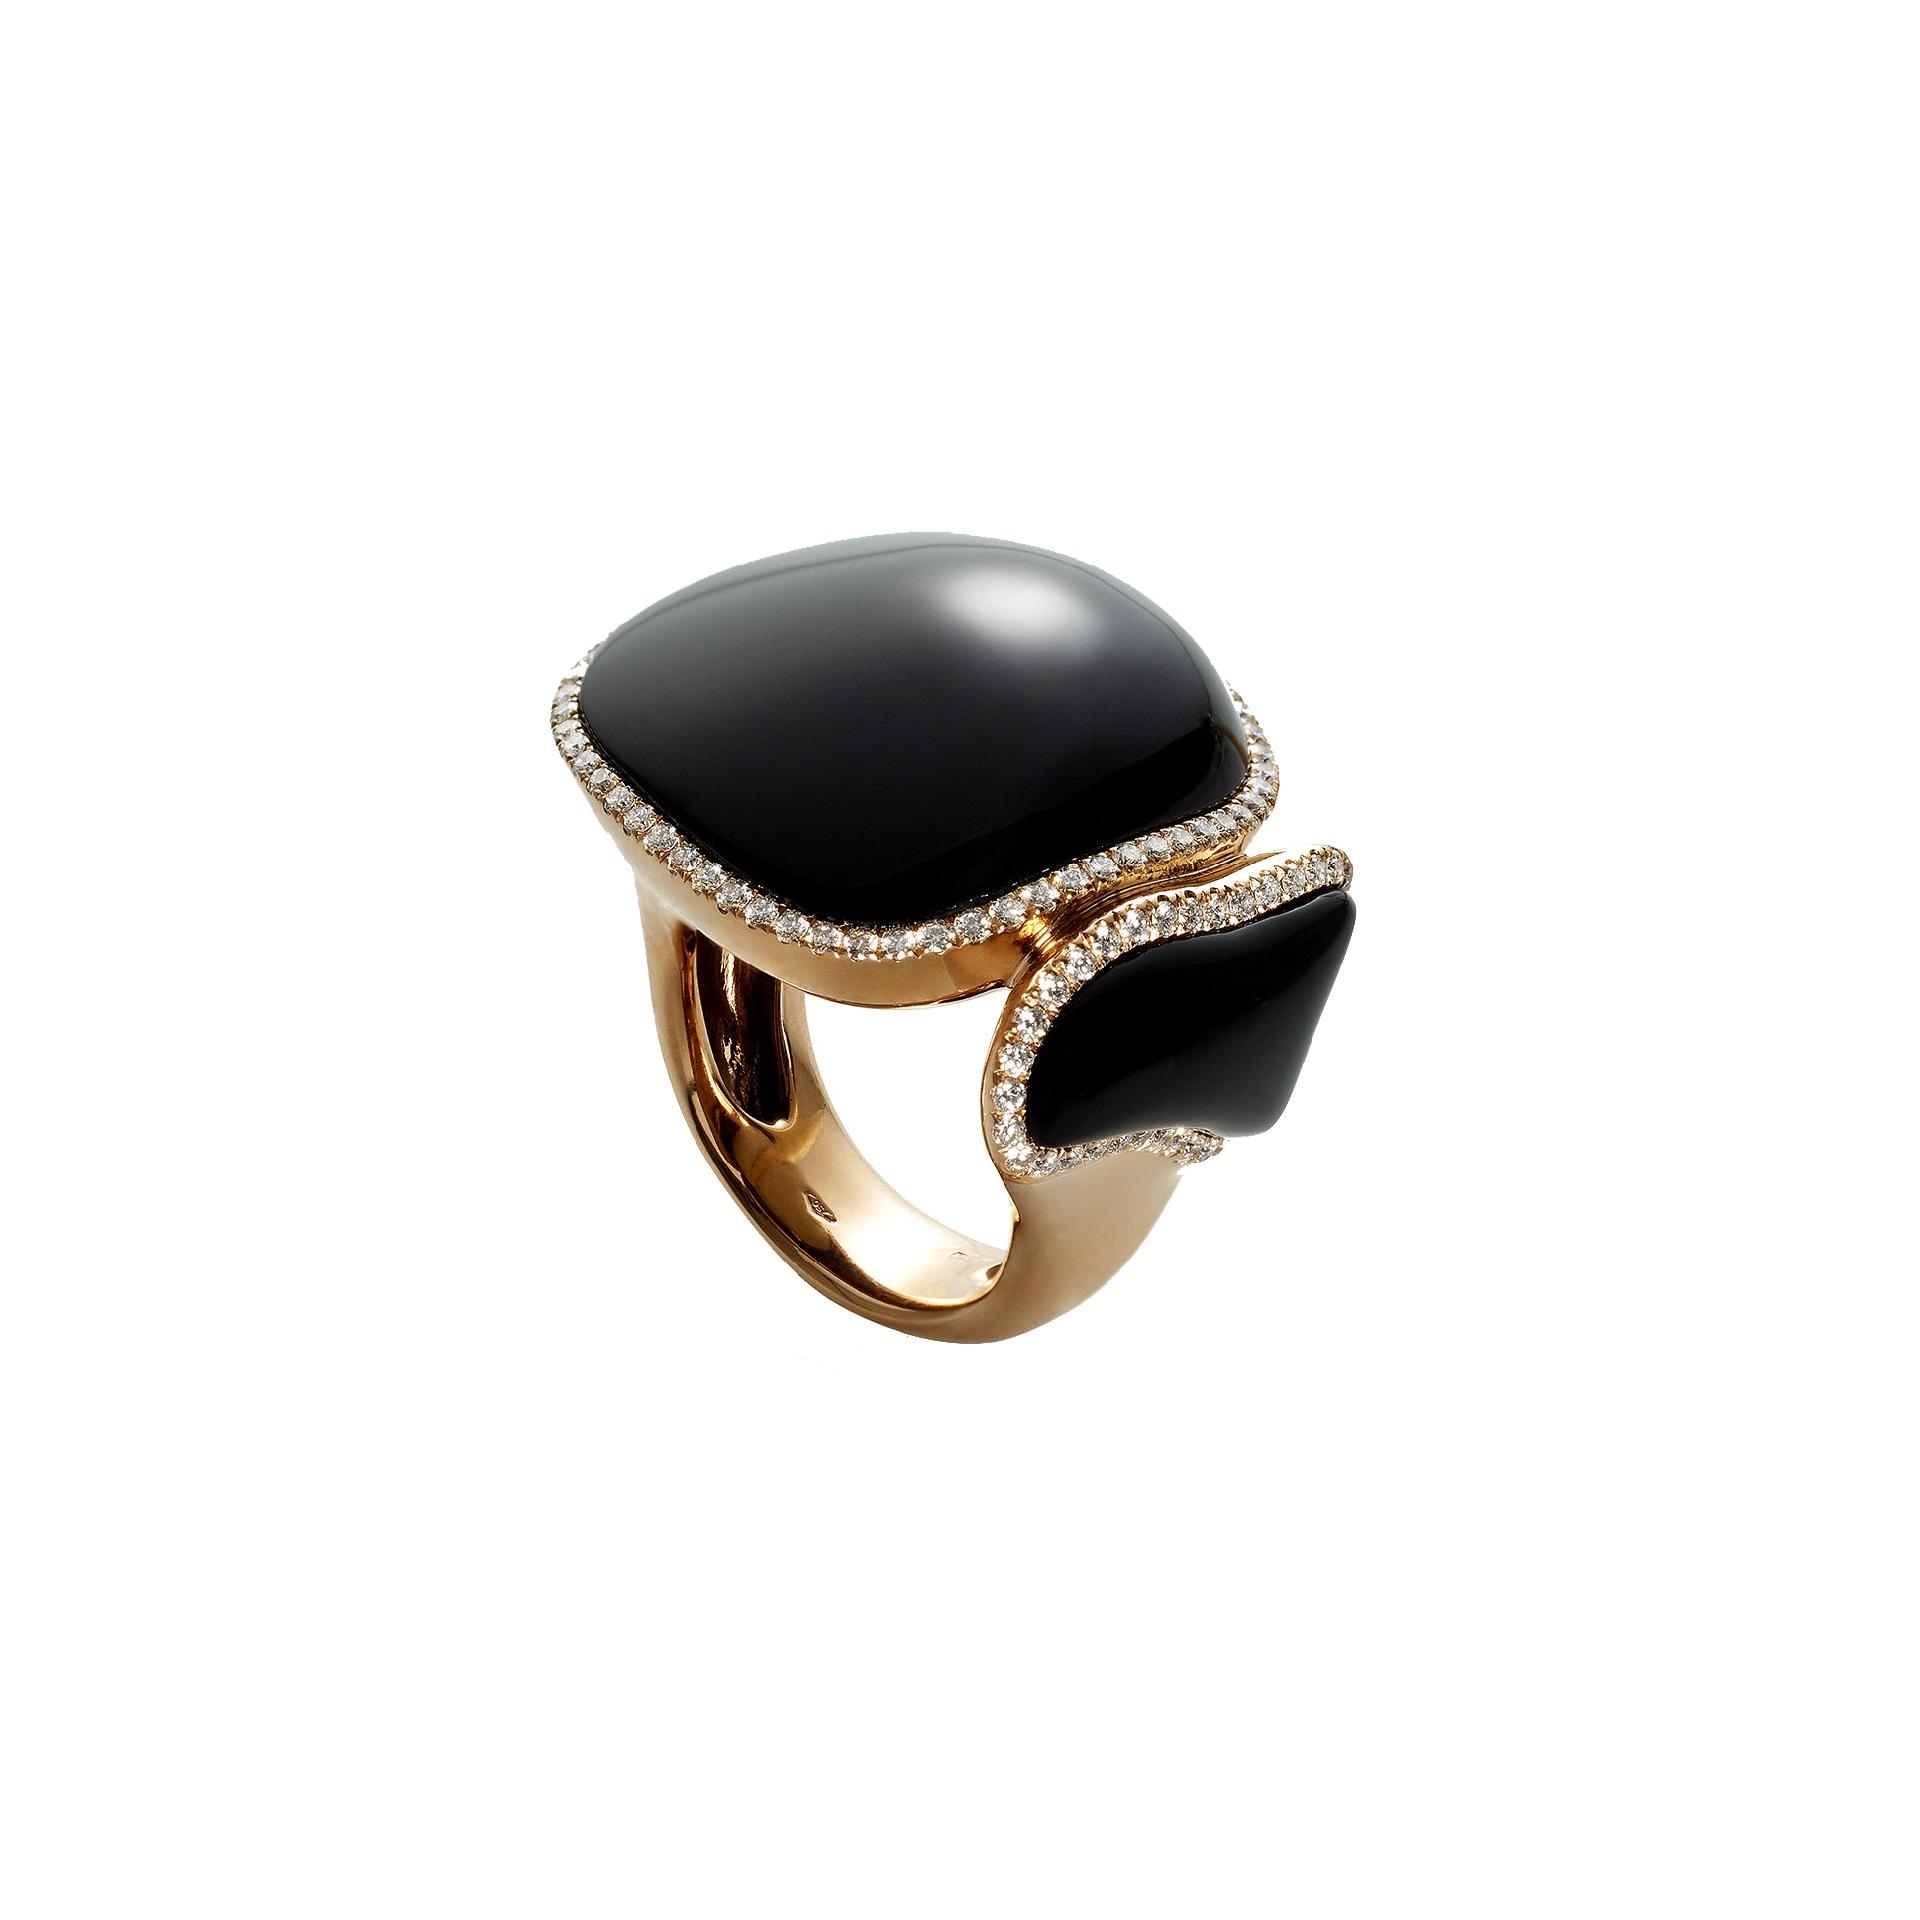 Chantecler Enchanté Ring aus Roségold mit Onyx und Brillanten